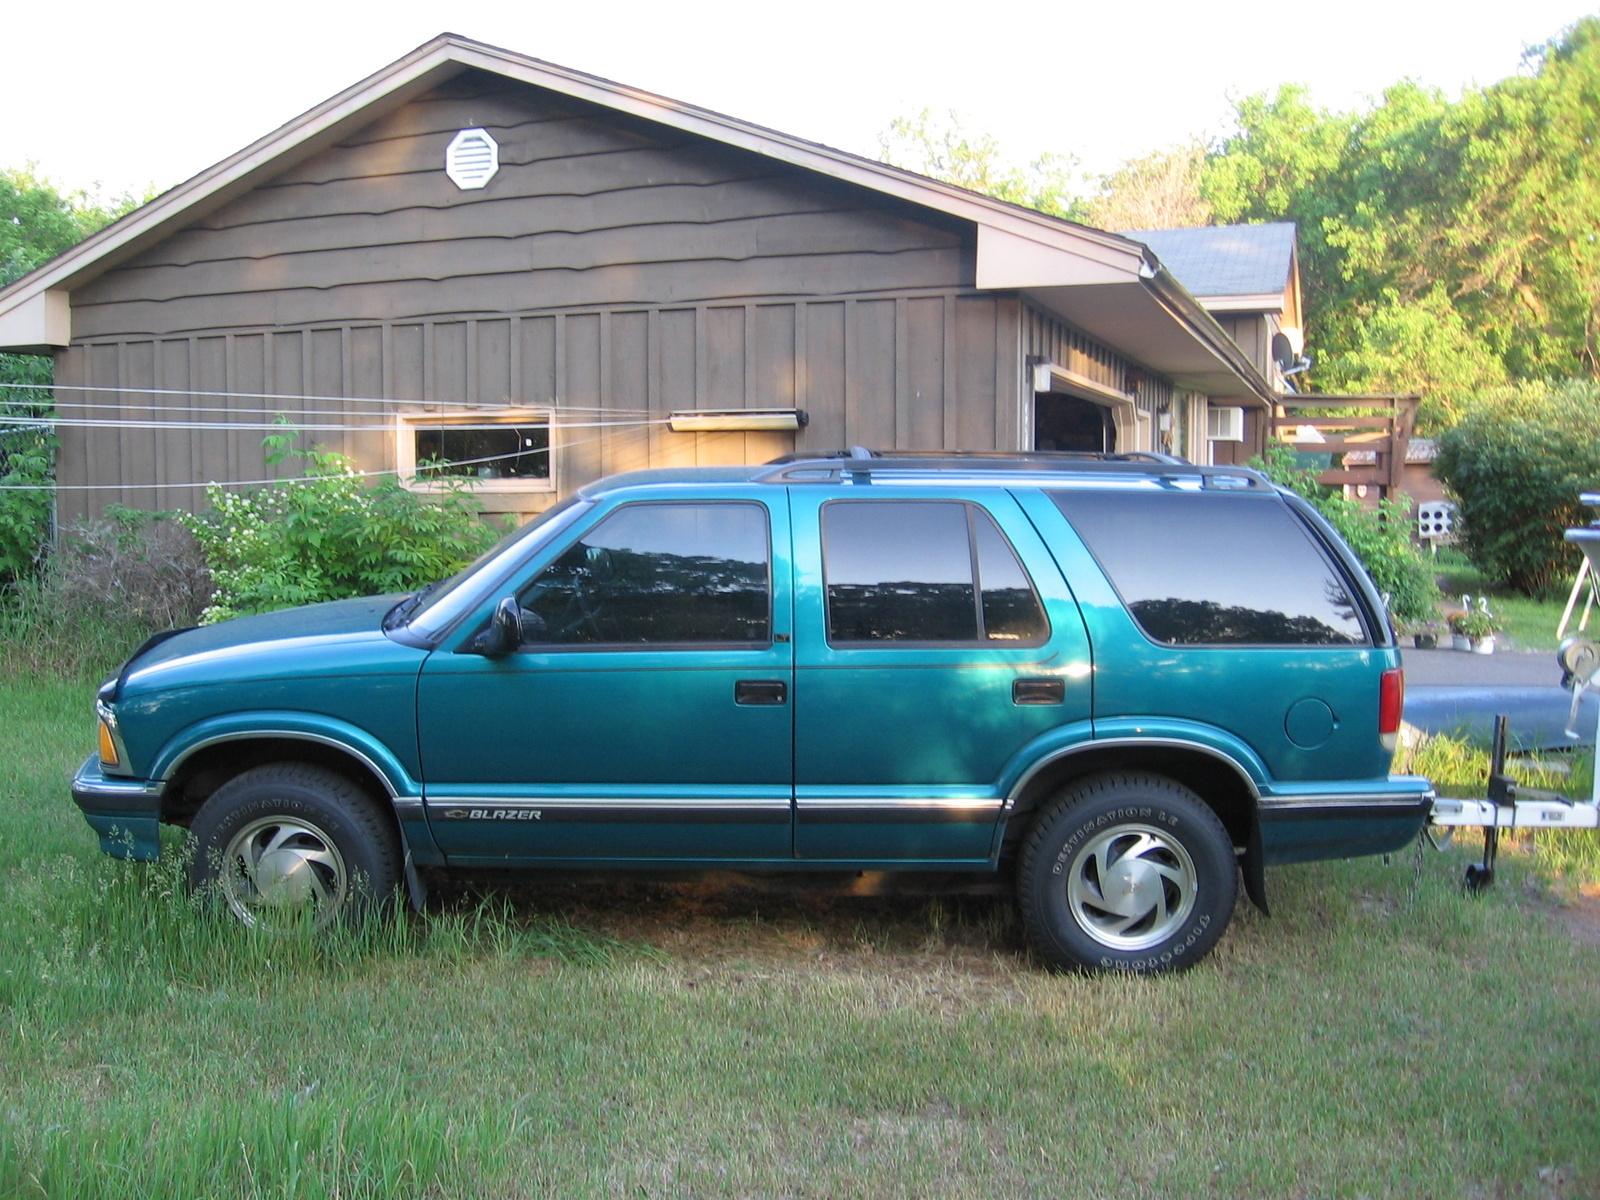 1996 Chevrolet Blazer Overview Cargurus